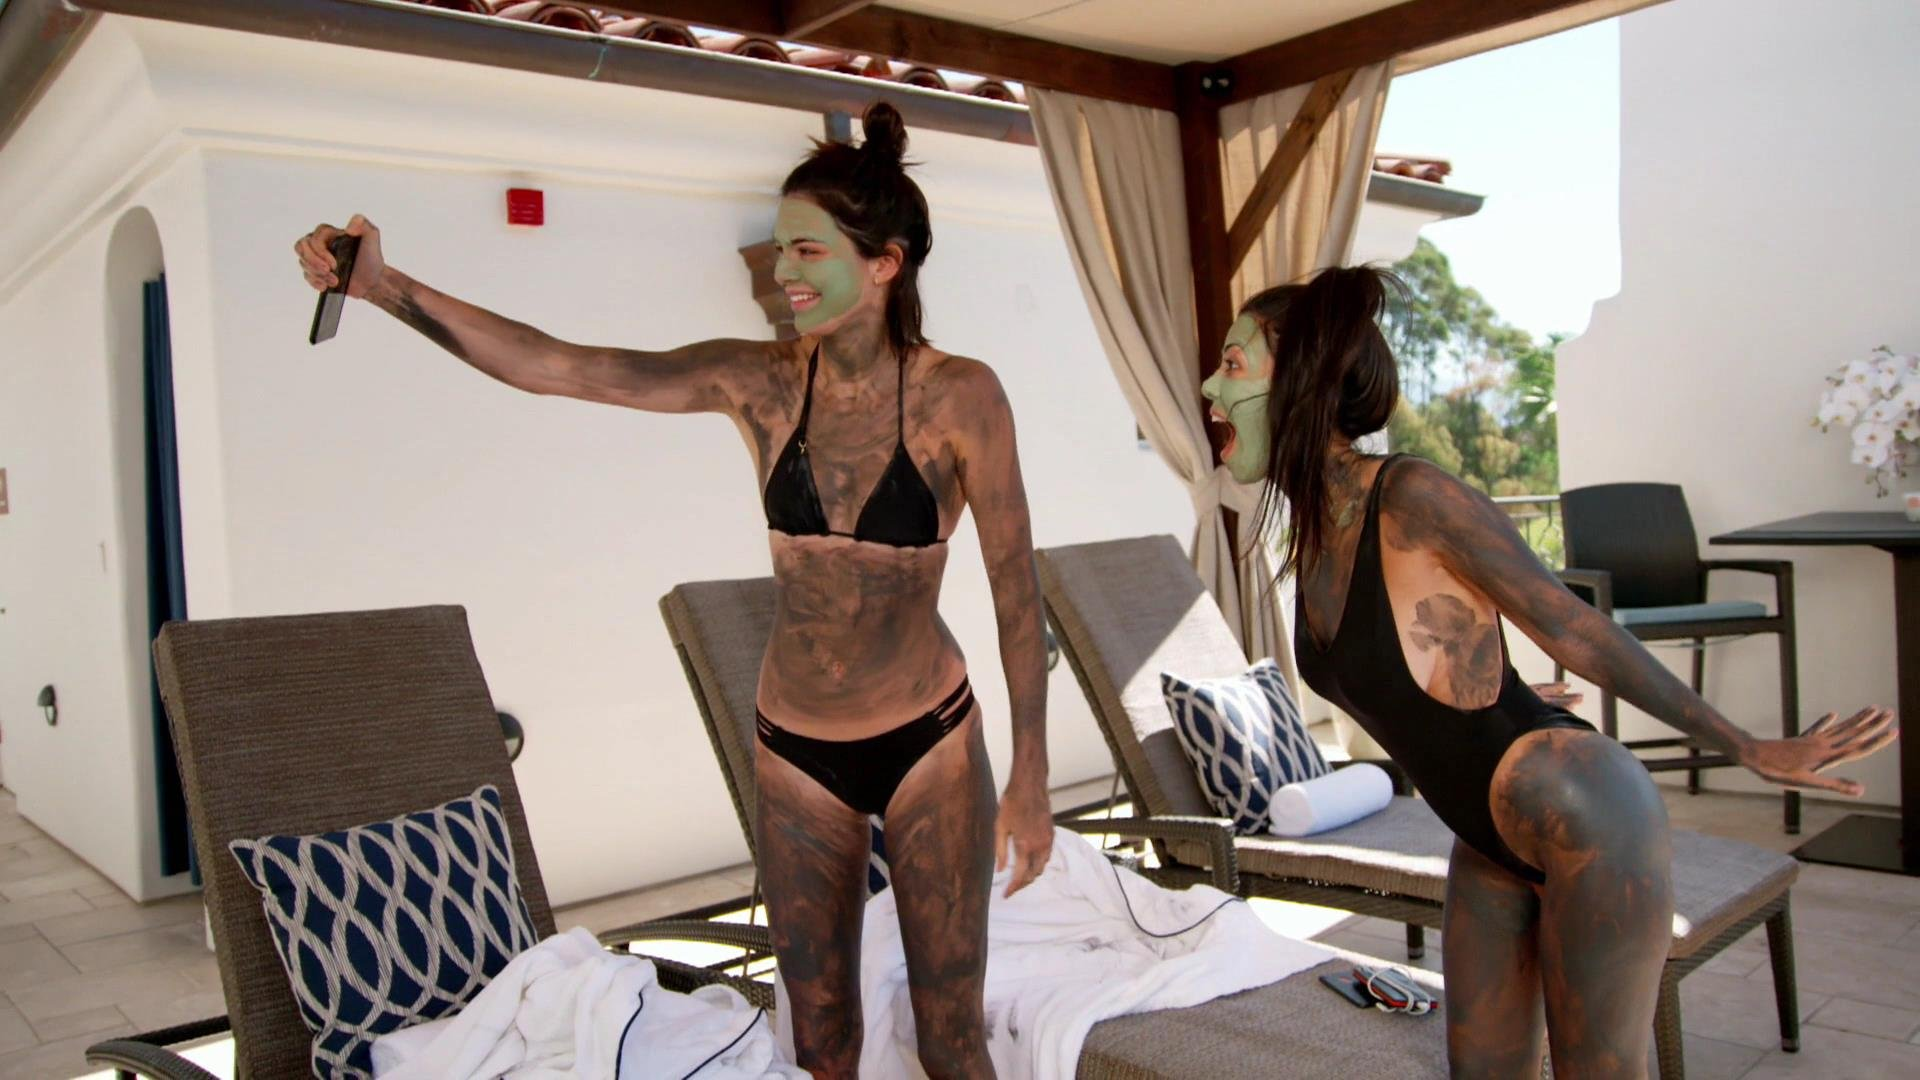 Kendall Jenner Kourtney Kardashian Sexy Keeping Up With